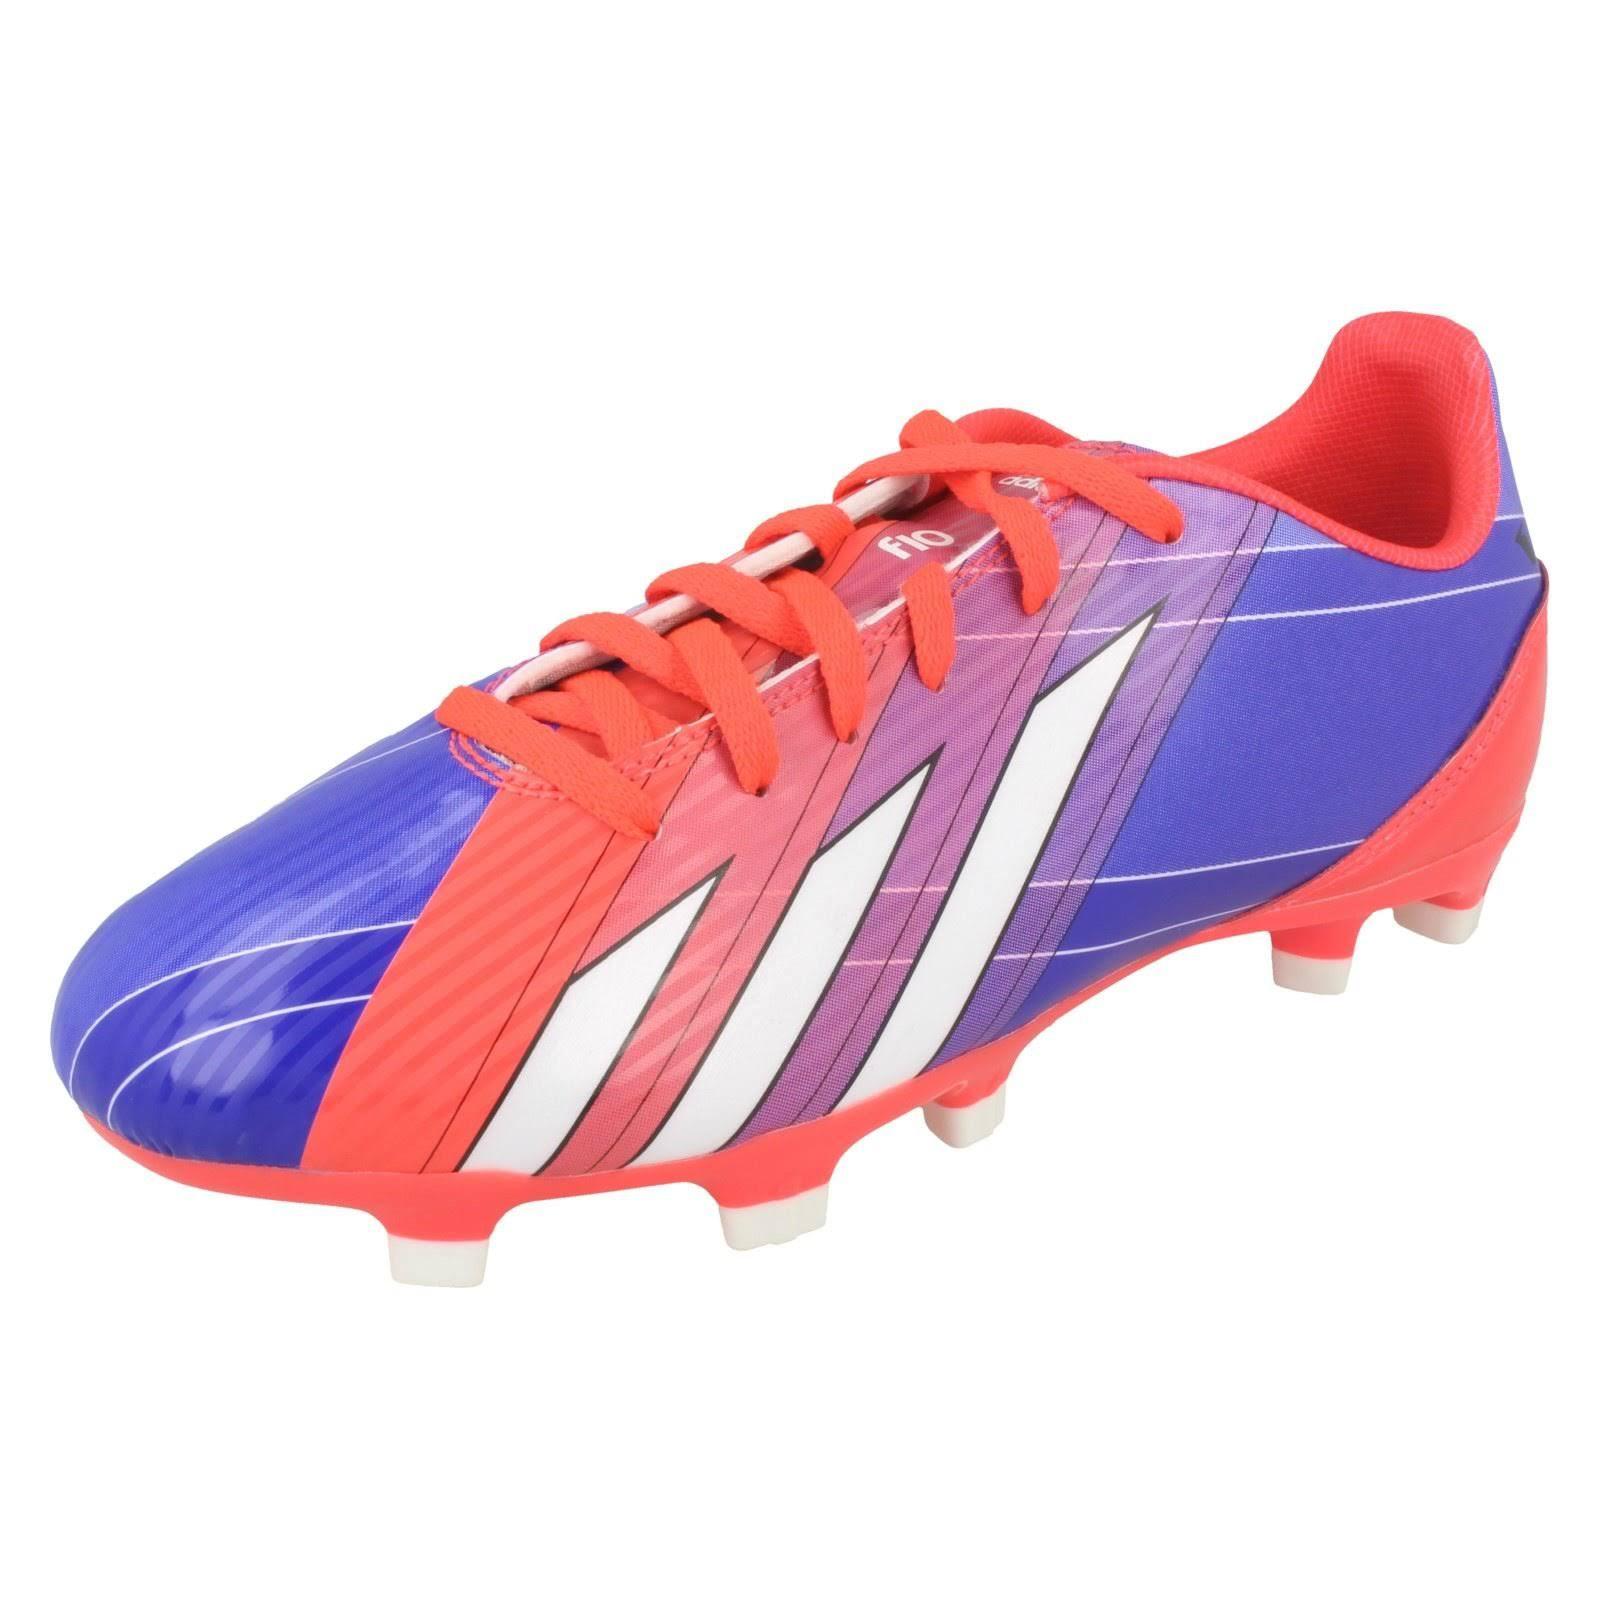 (UK 4.5, Turbo/Black 1/Runwht (Red)) Boys Adidas Lionel Messi Football Boots F10 TRX FG J